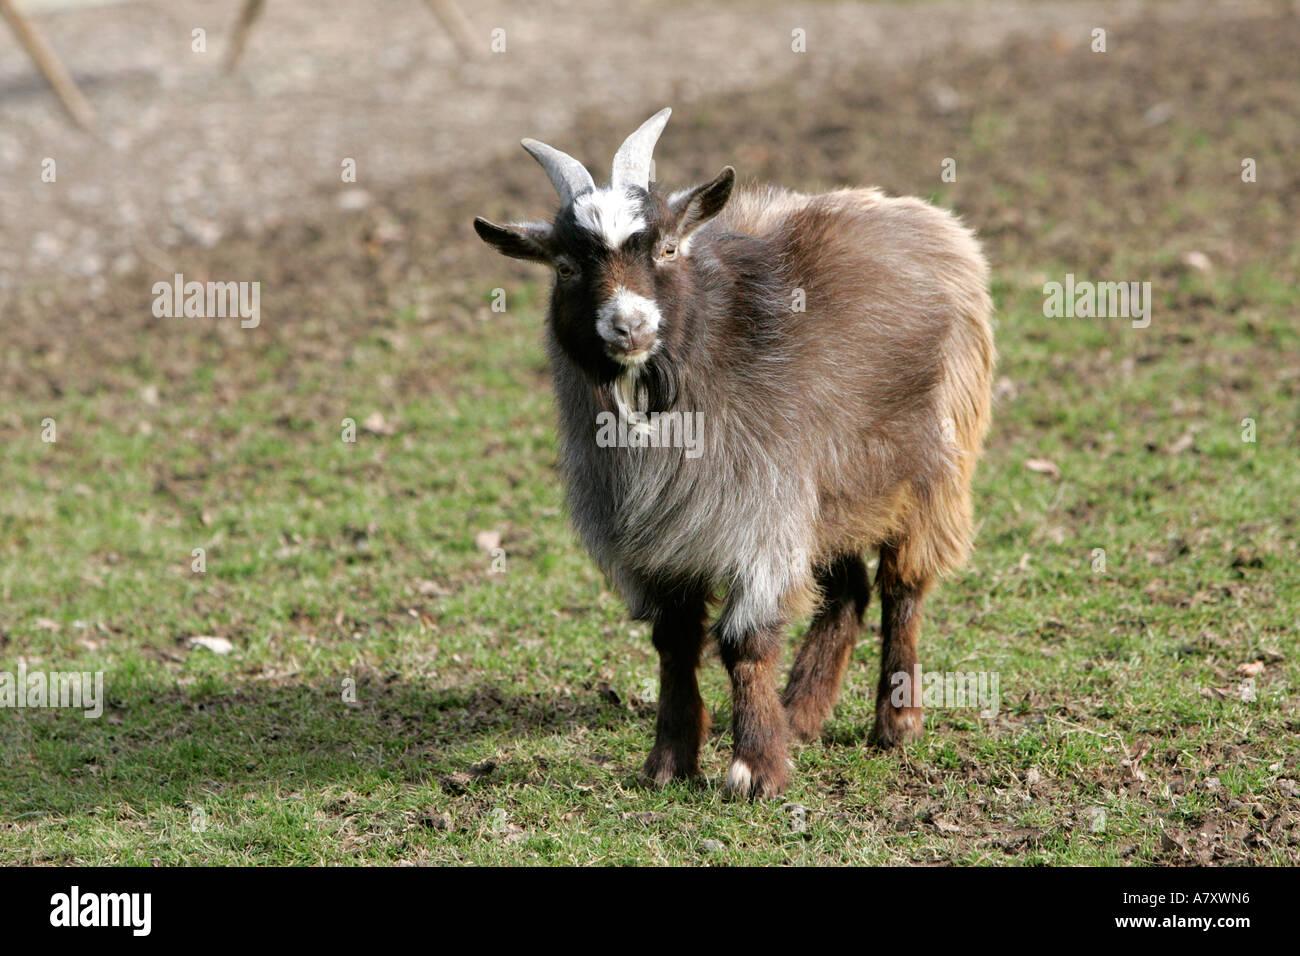 Pygmy Goat Pet Stock Photos & Pygmy Goat Pet Stock Images